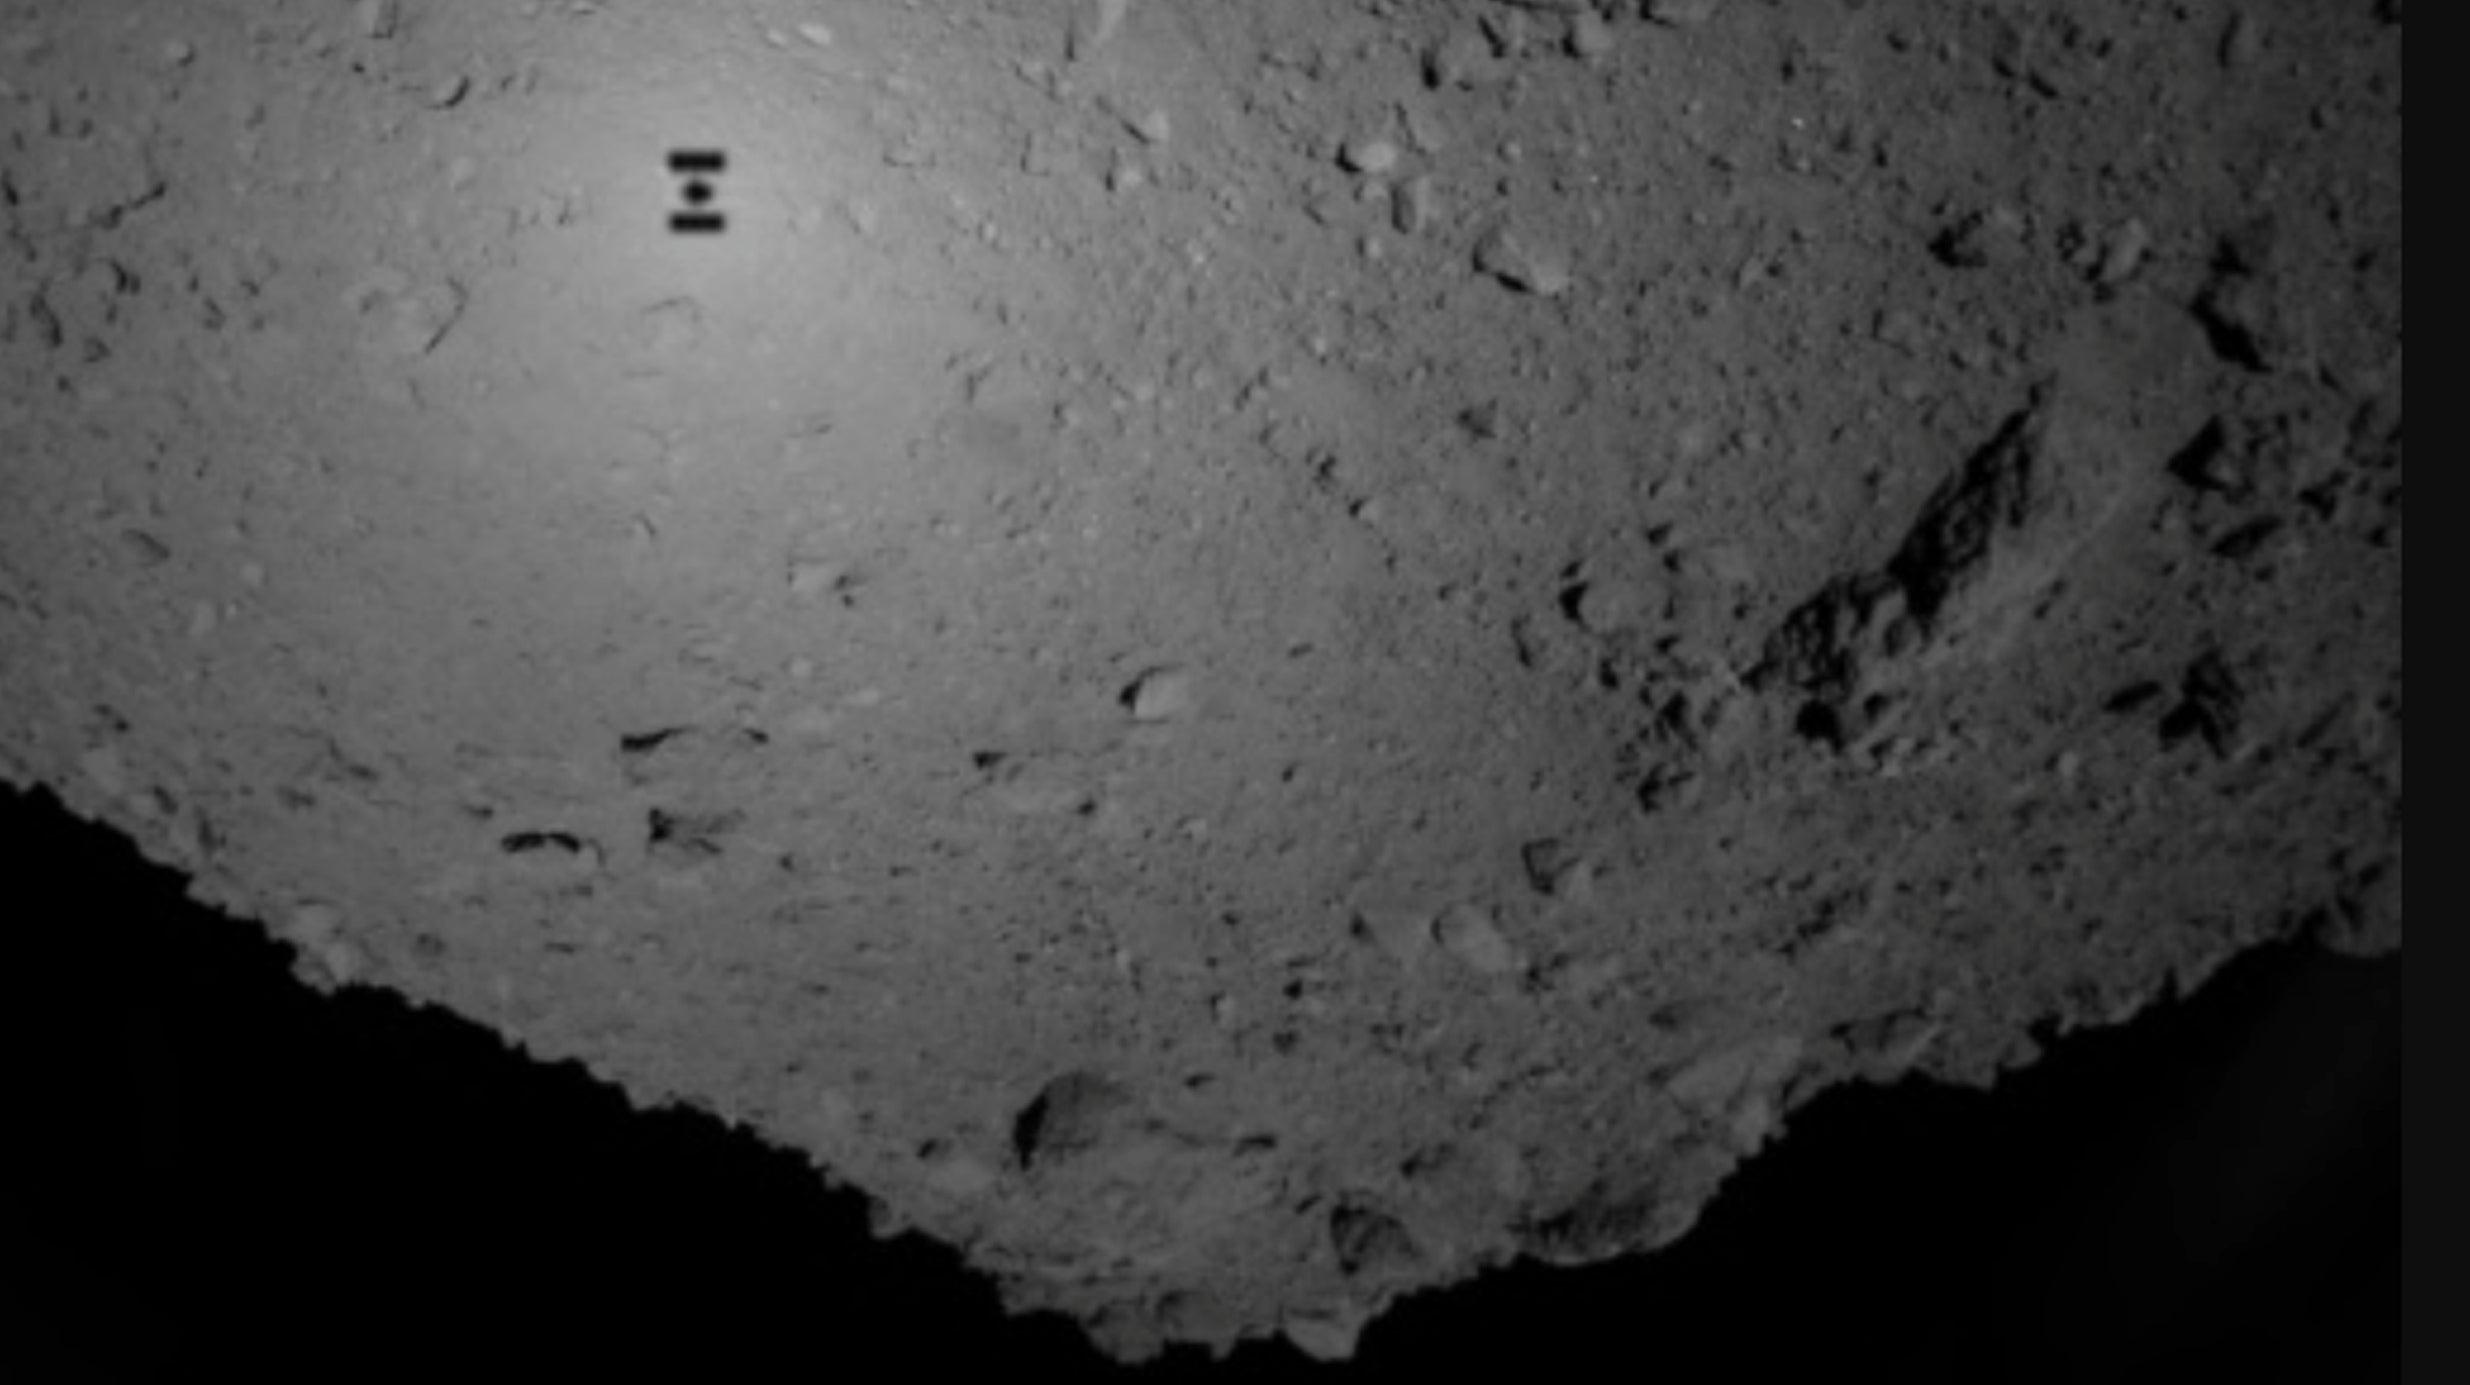 Japan's Hayabusa2 Spacecraft Successfully Deploys Landers To Asteroid Ryugu's Surface